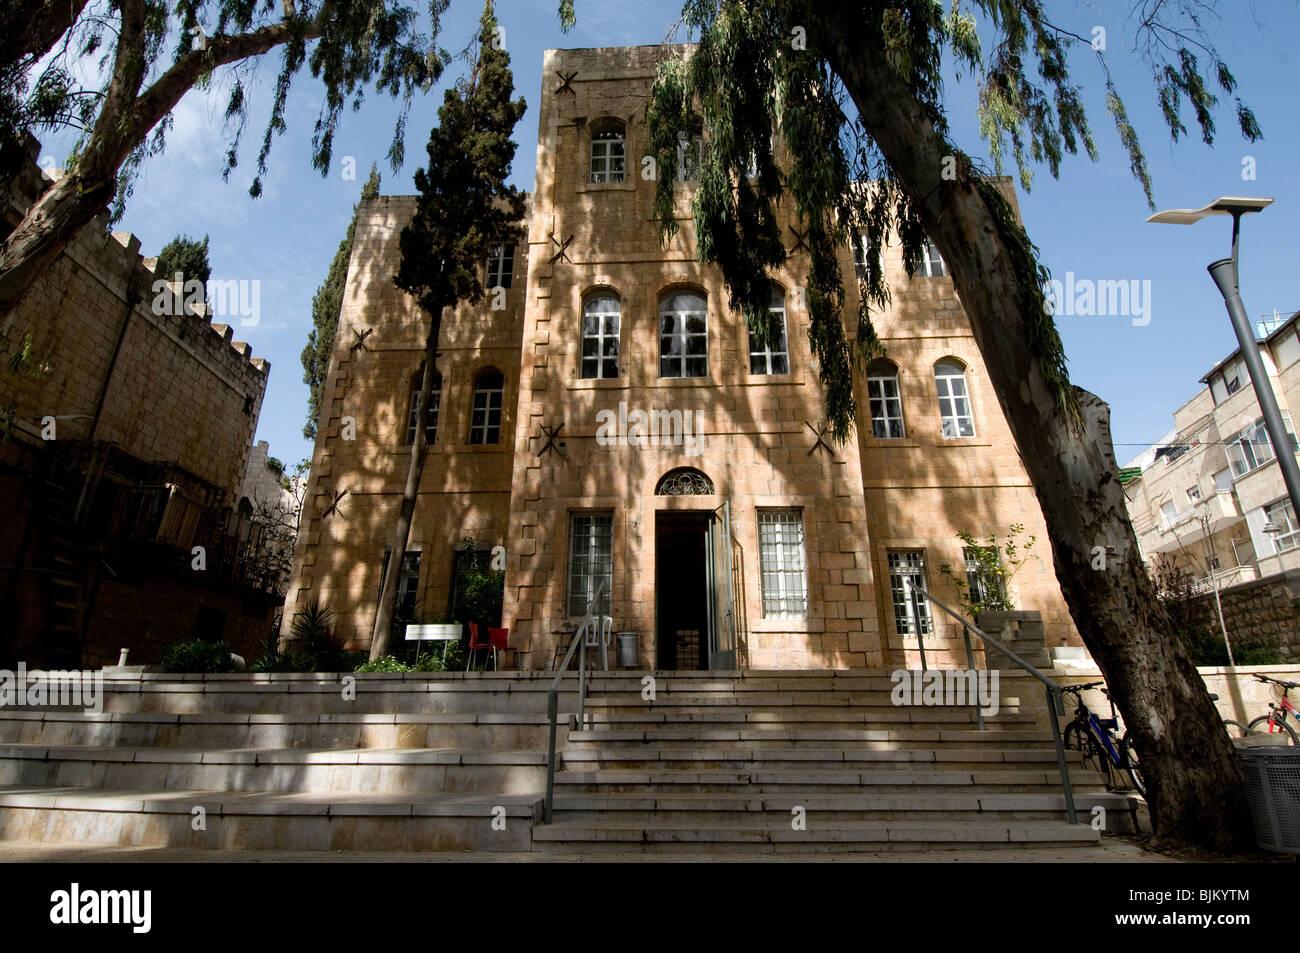 Bezalel Academy Of Arts And Design